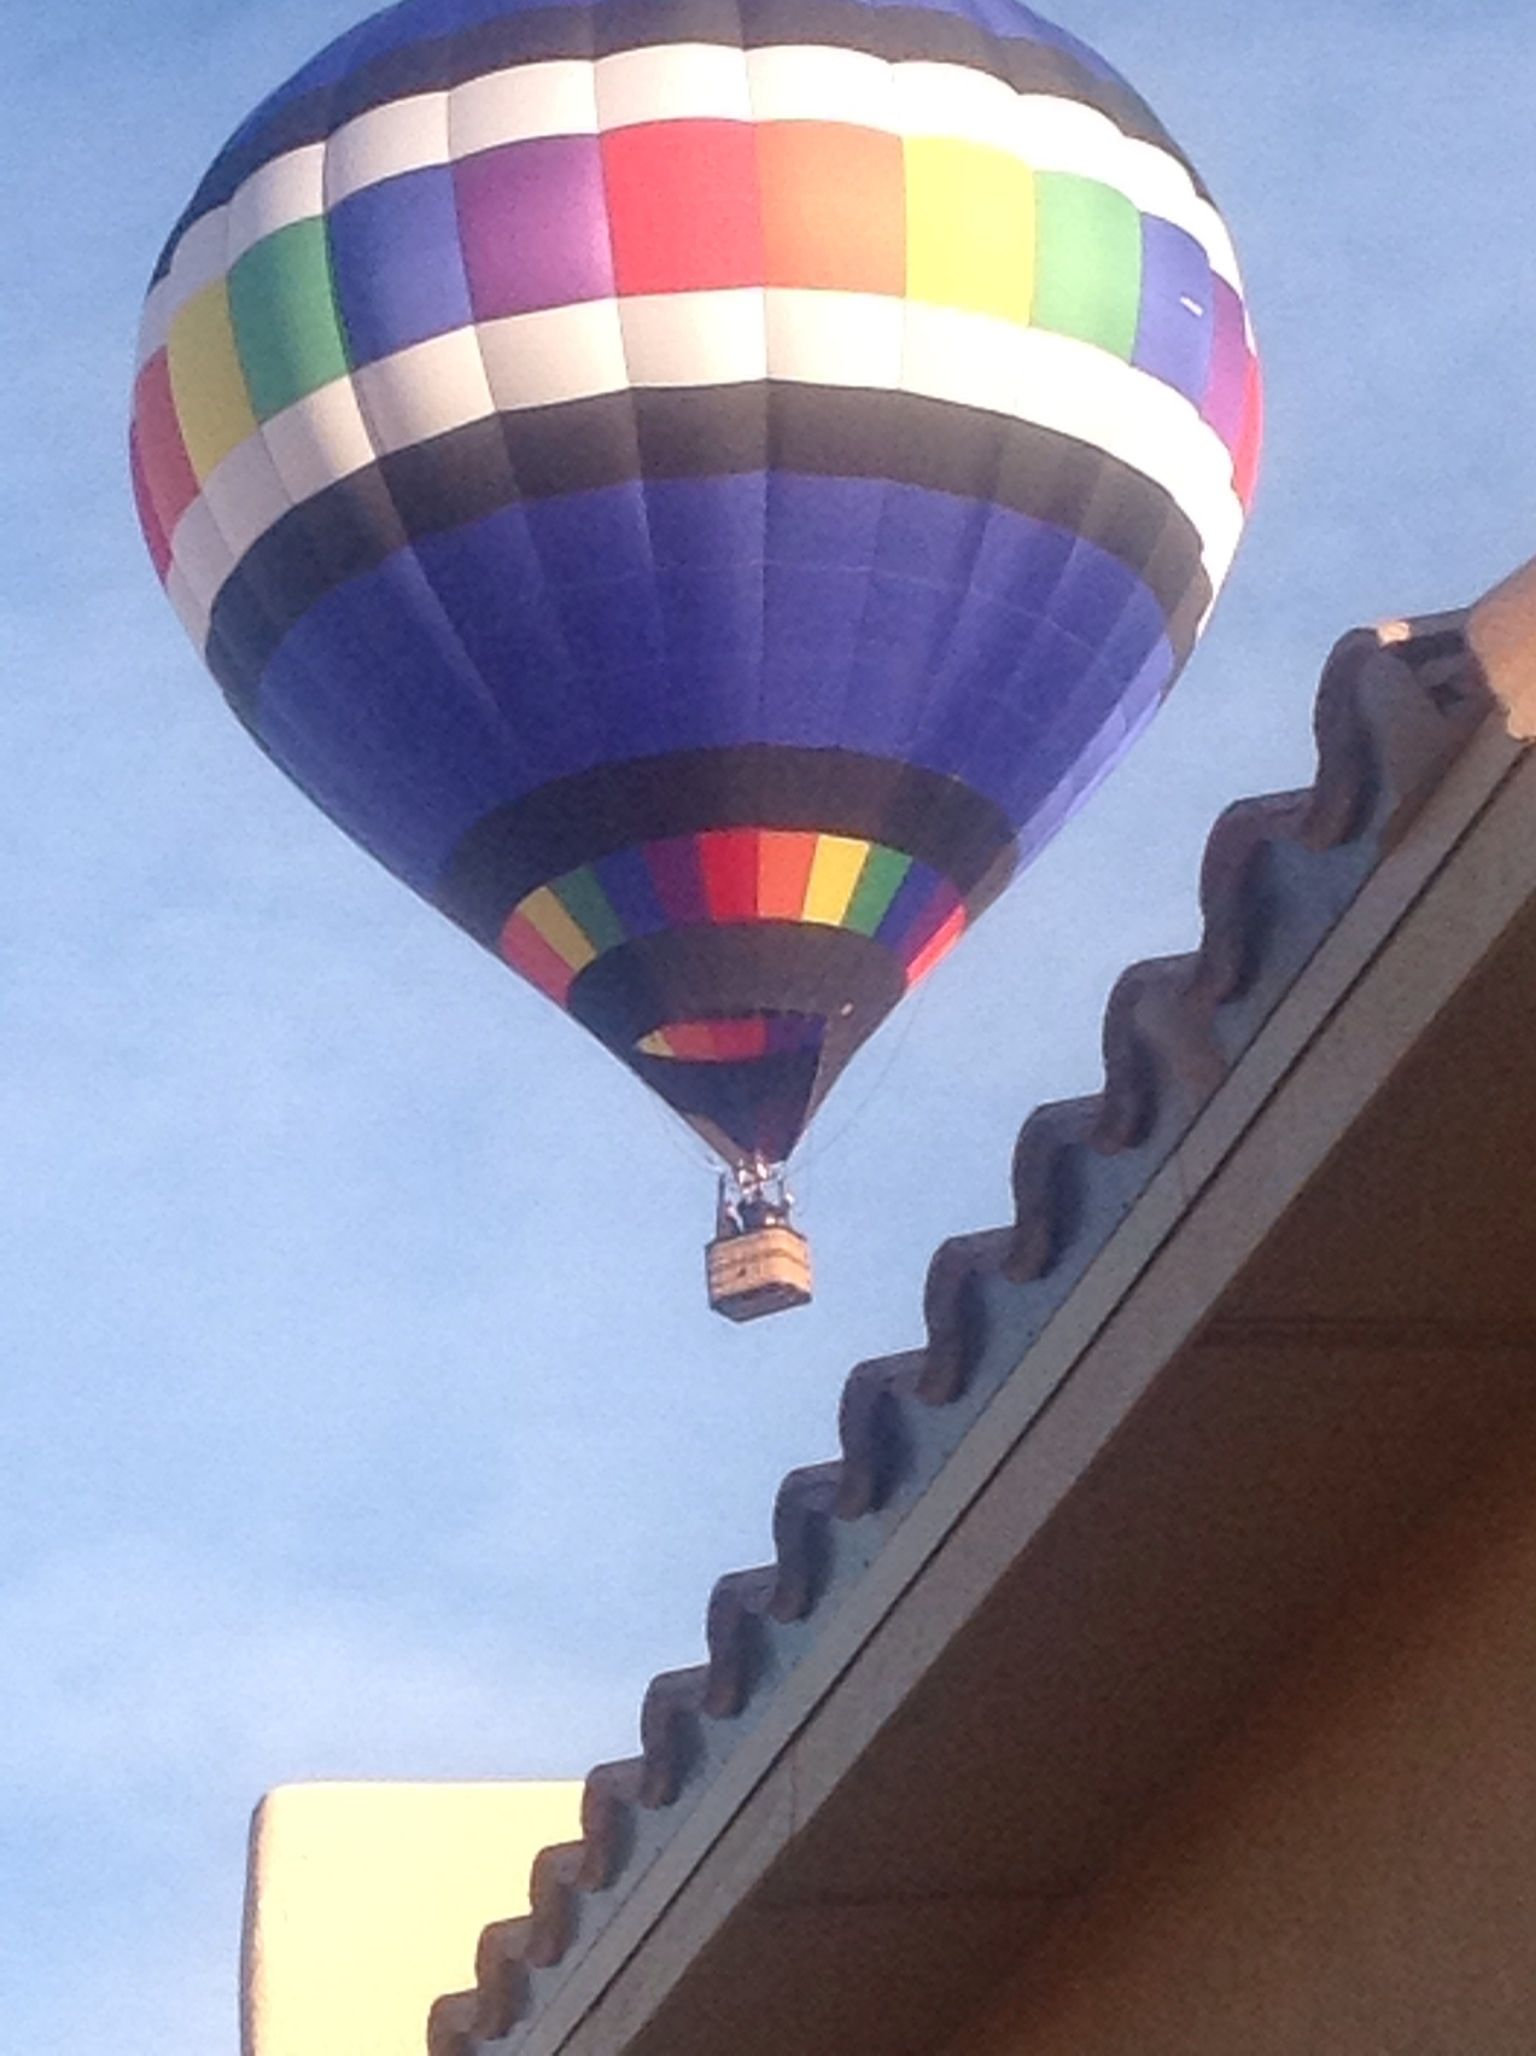 Albuquerque international balloon fiesta. Balloon fiesta